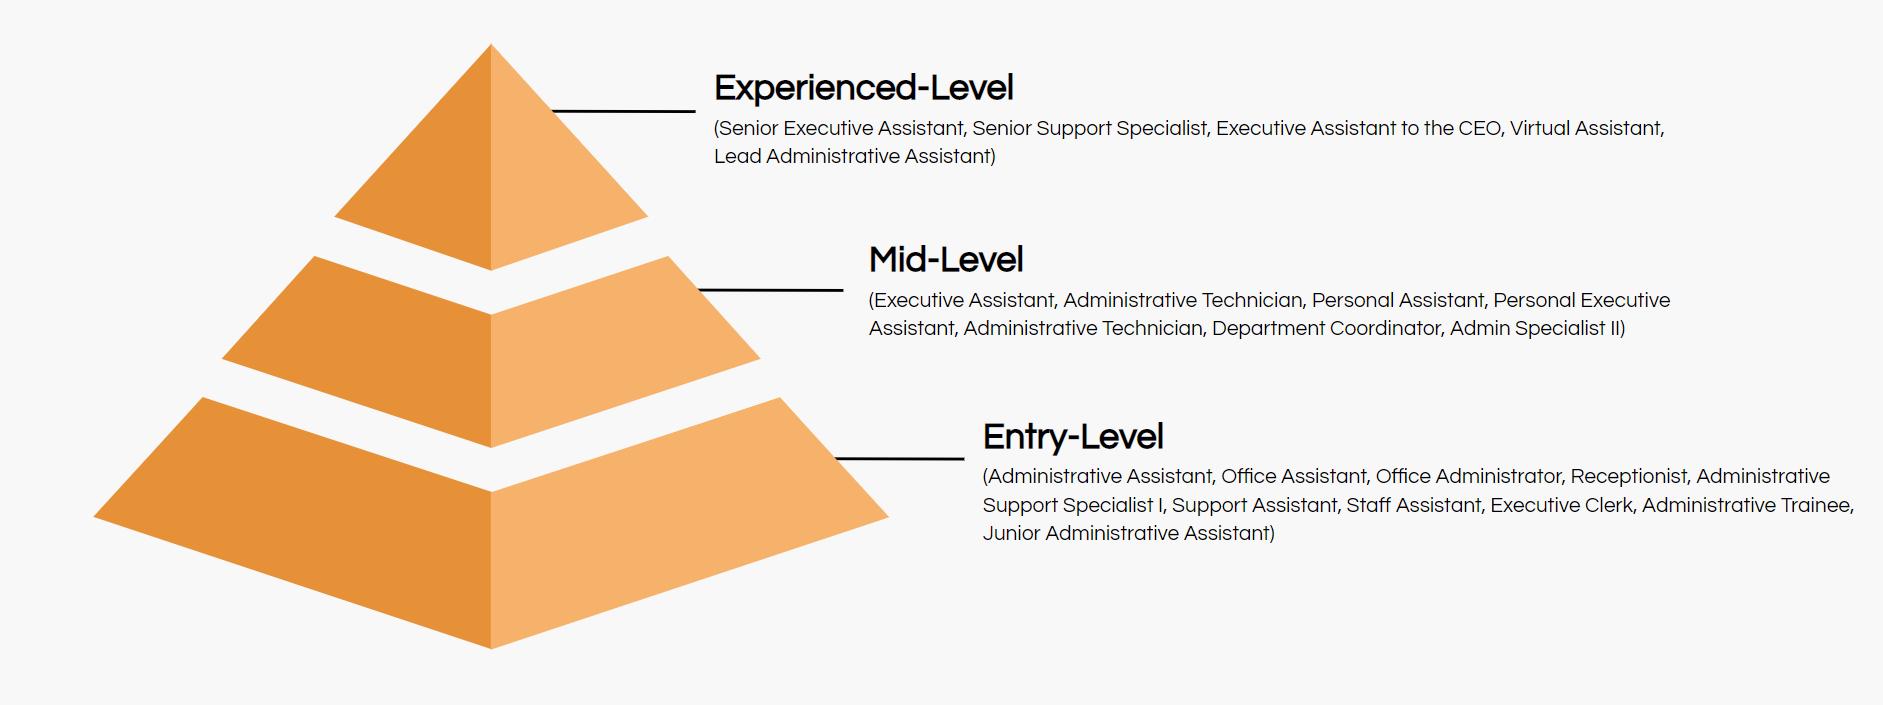 executive assistant job titles hierarchy